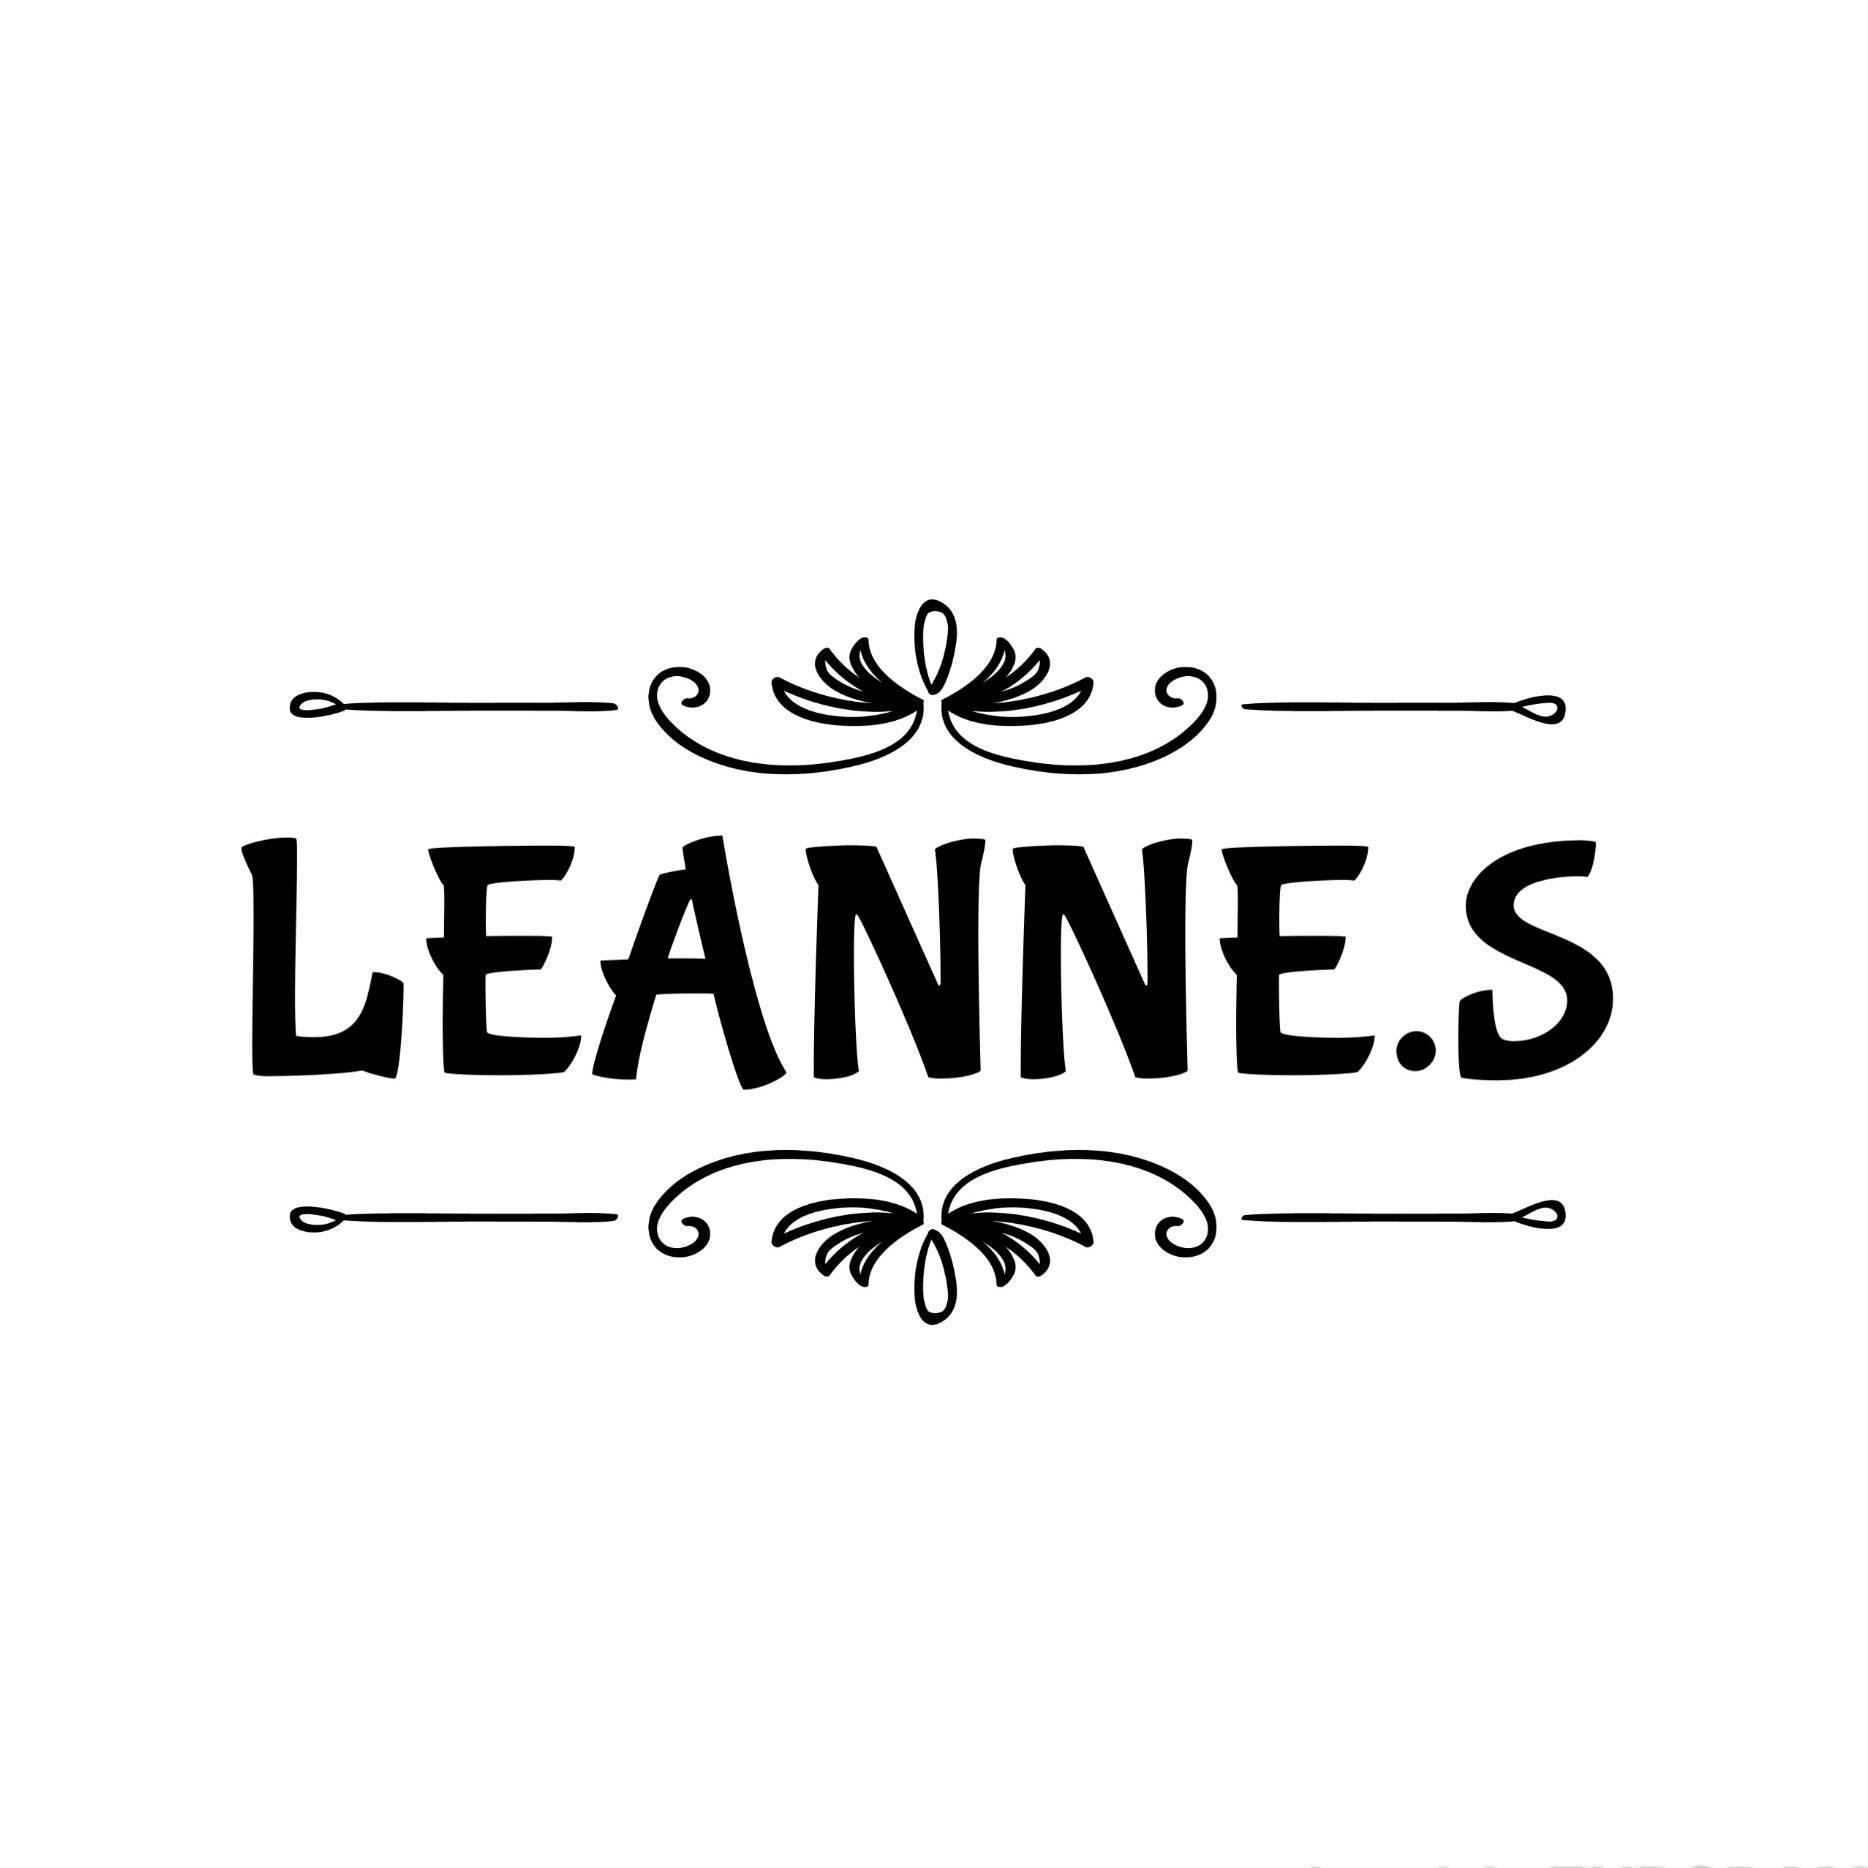 leanne.s